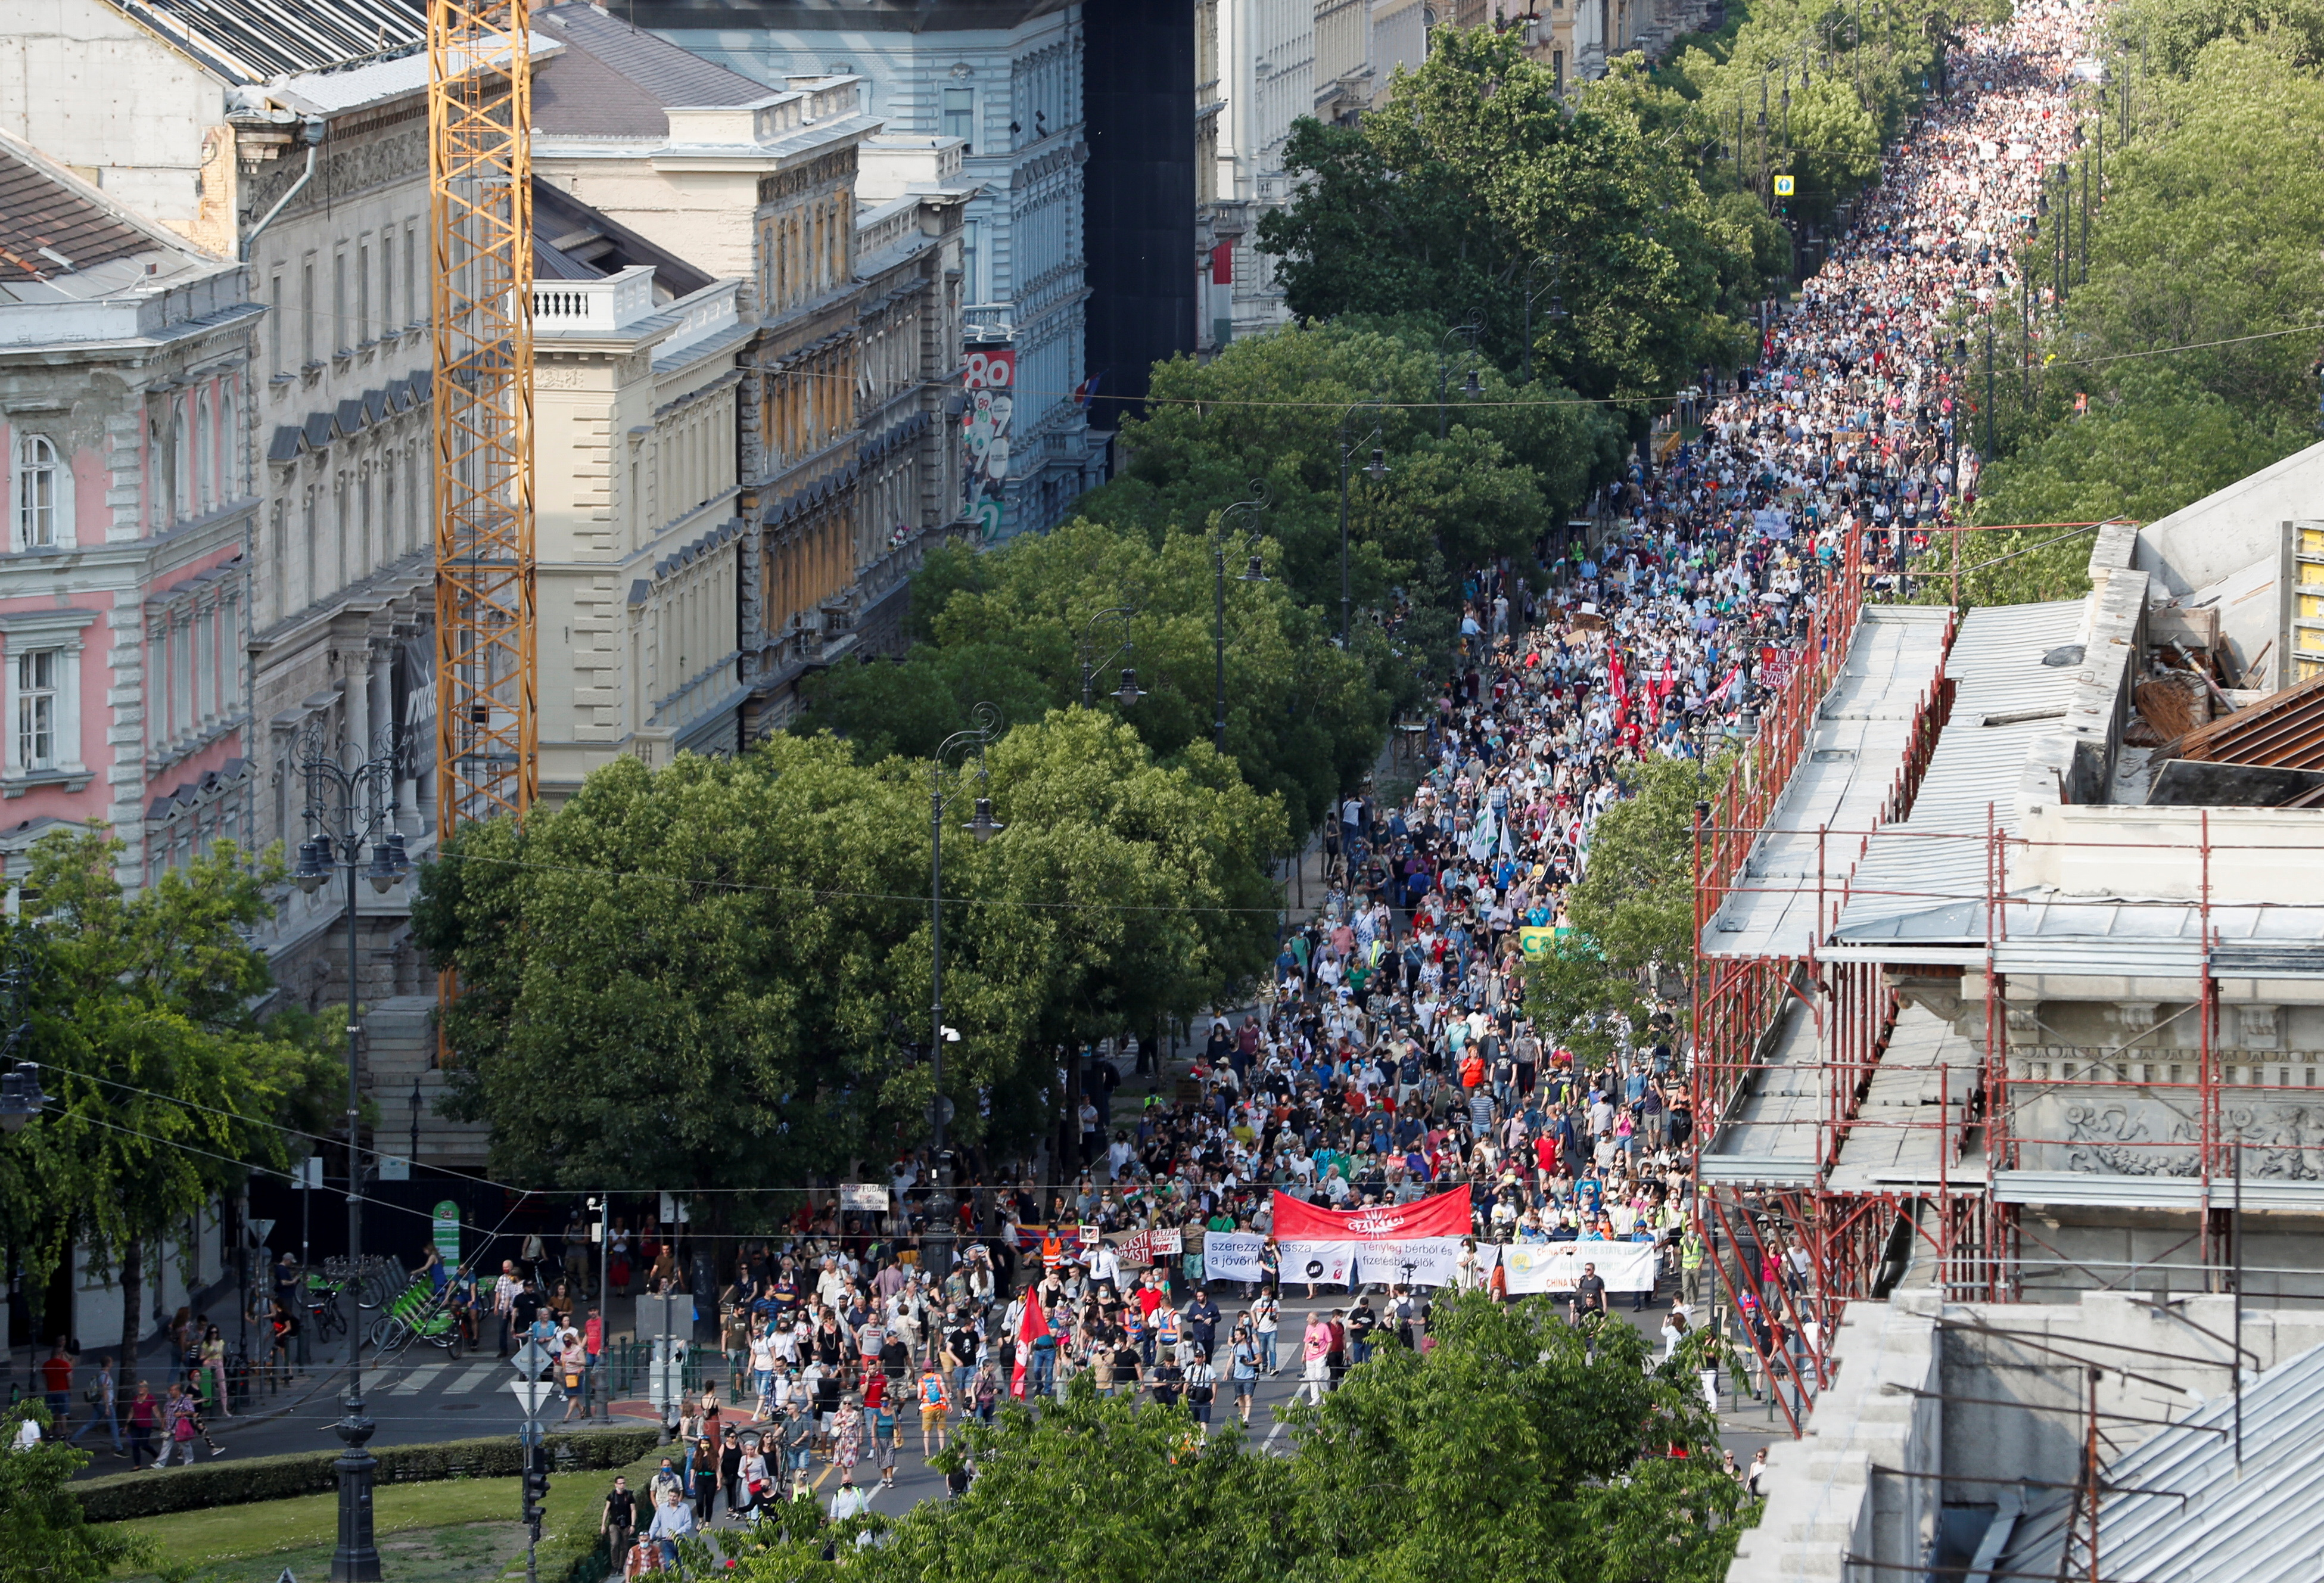 Demonstrators protest against the planned Chinese Fudan University campus in Budapest, Hungary, June 5, 2021. REUTERS/Bernadett Szabo